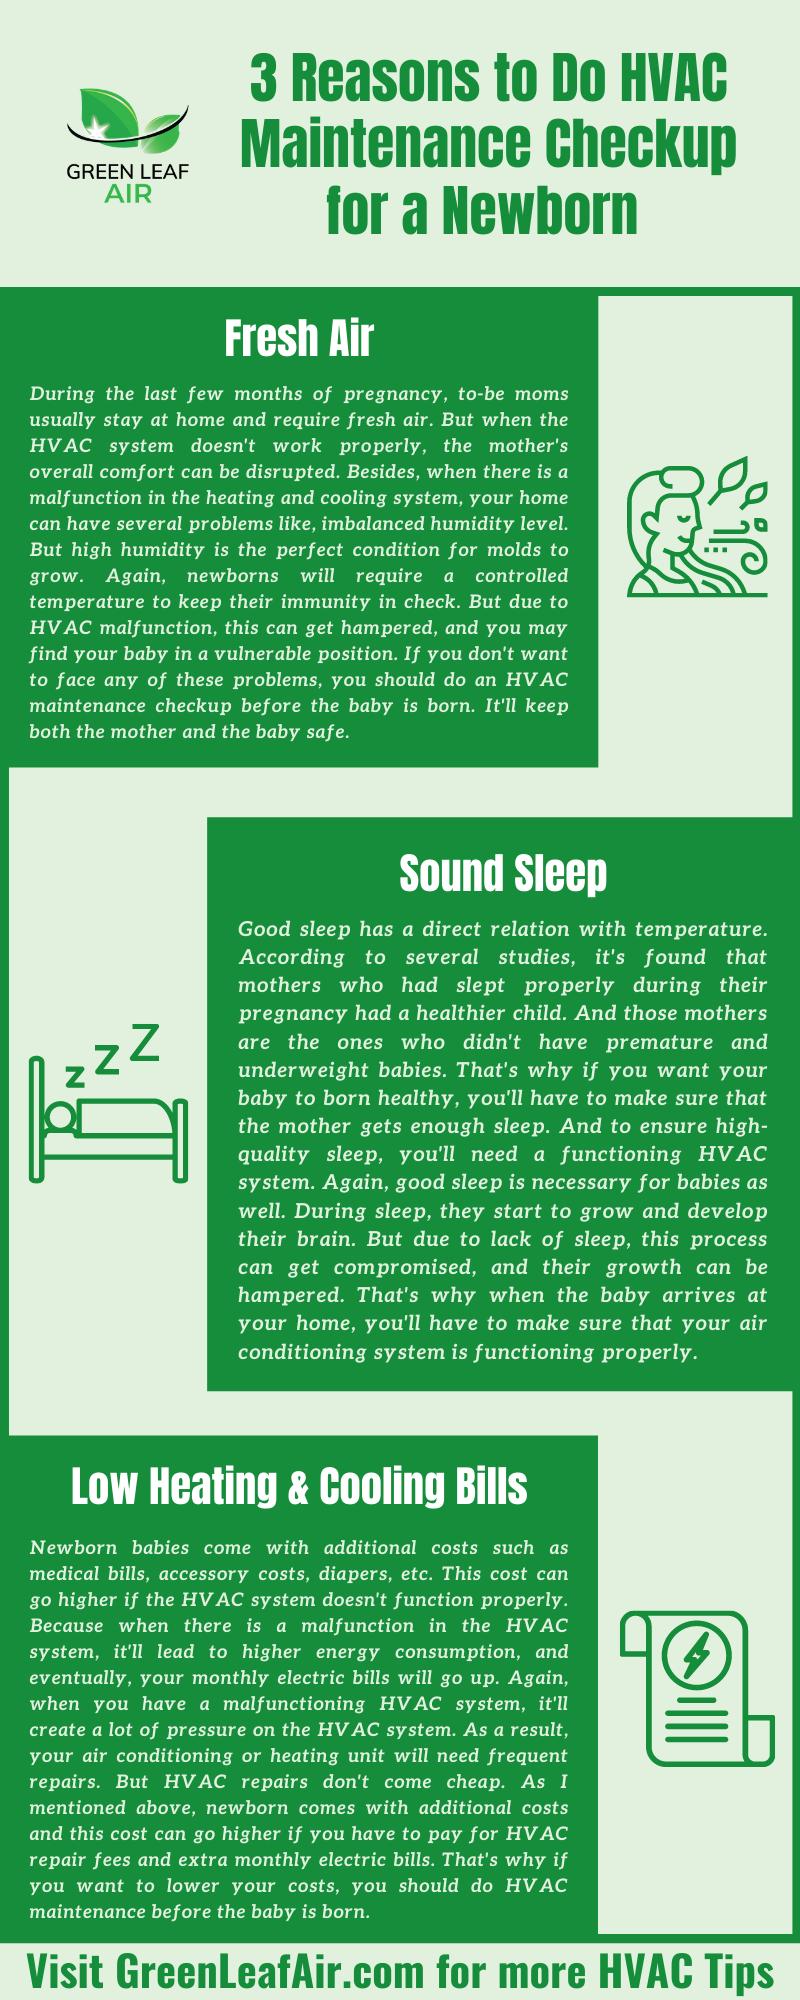 3 Reasons to Do HVAC Maintenance Checkup for a Newborn